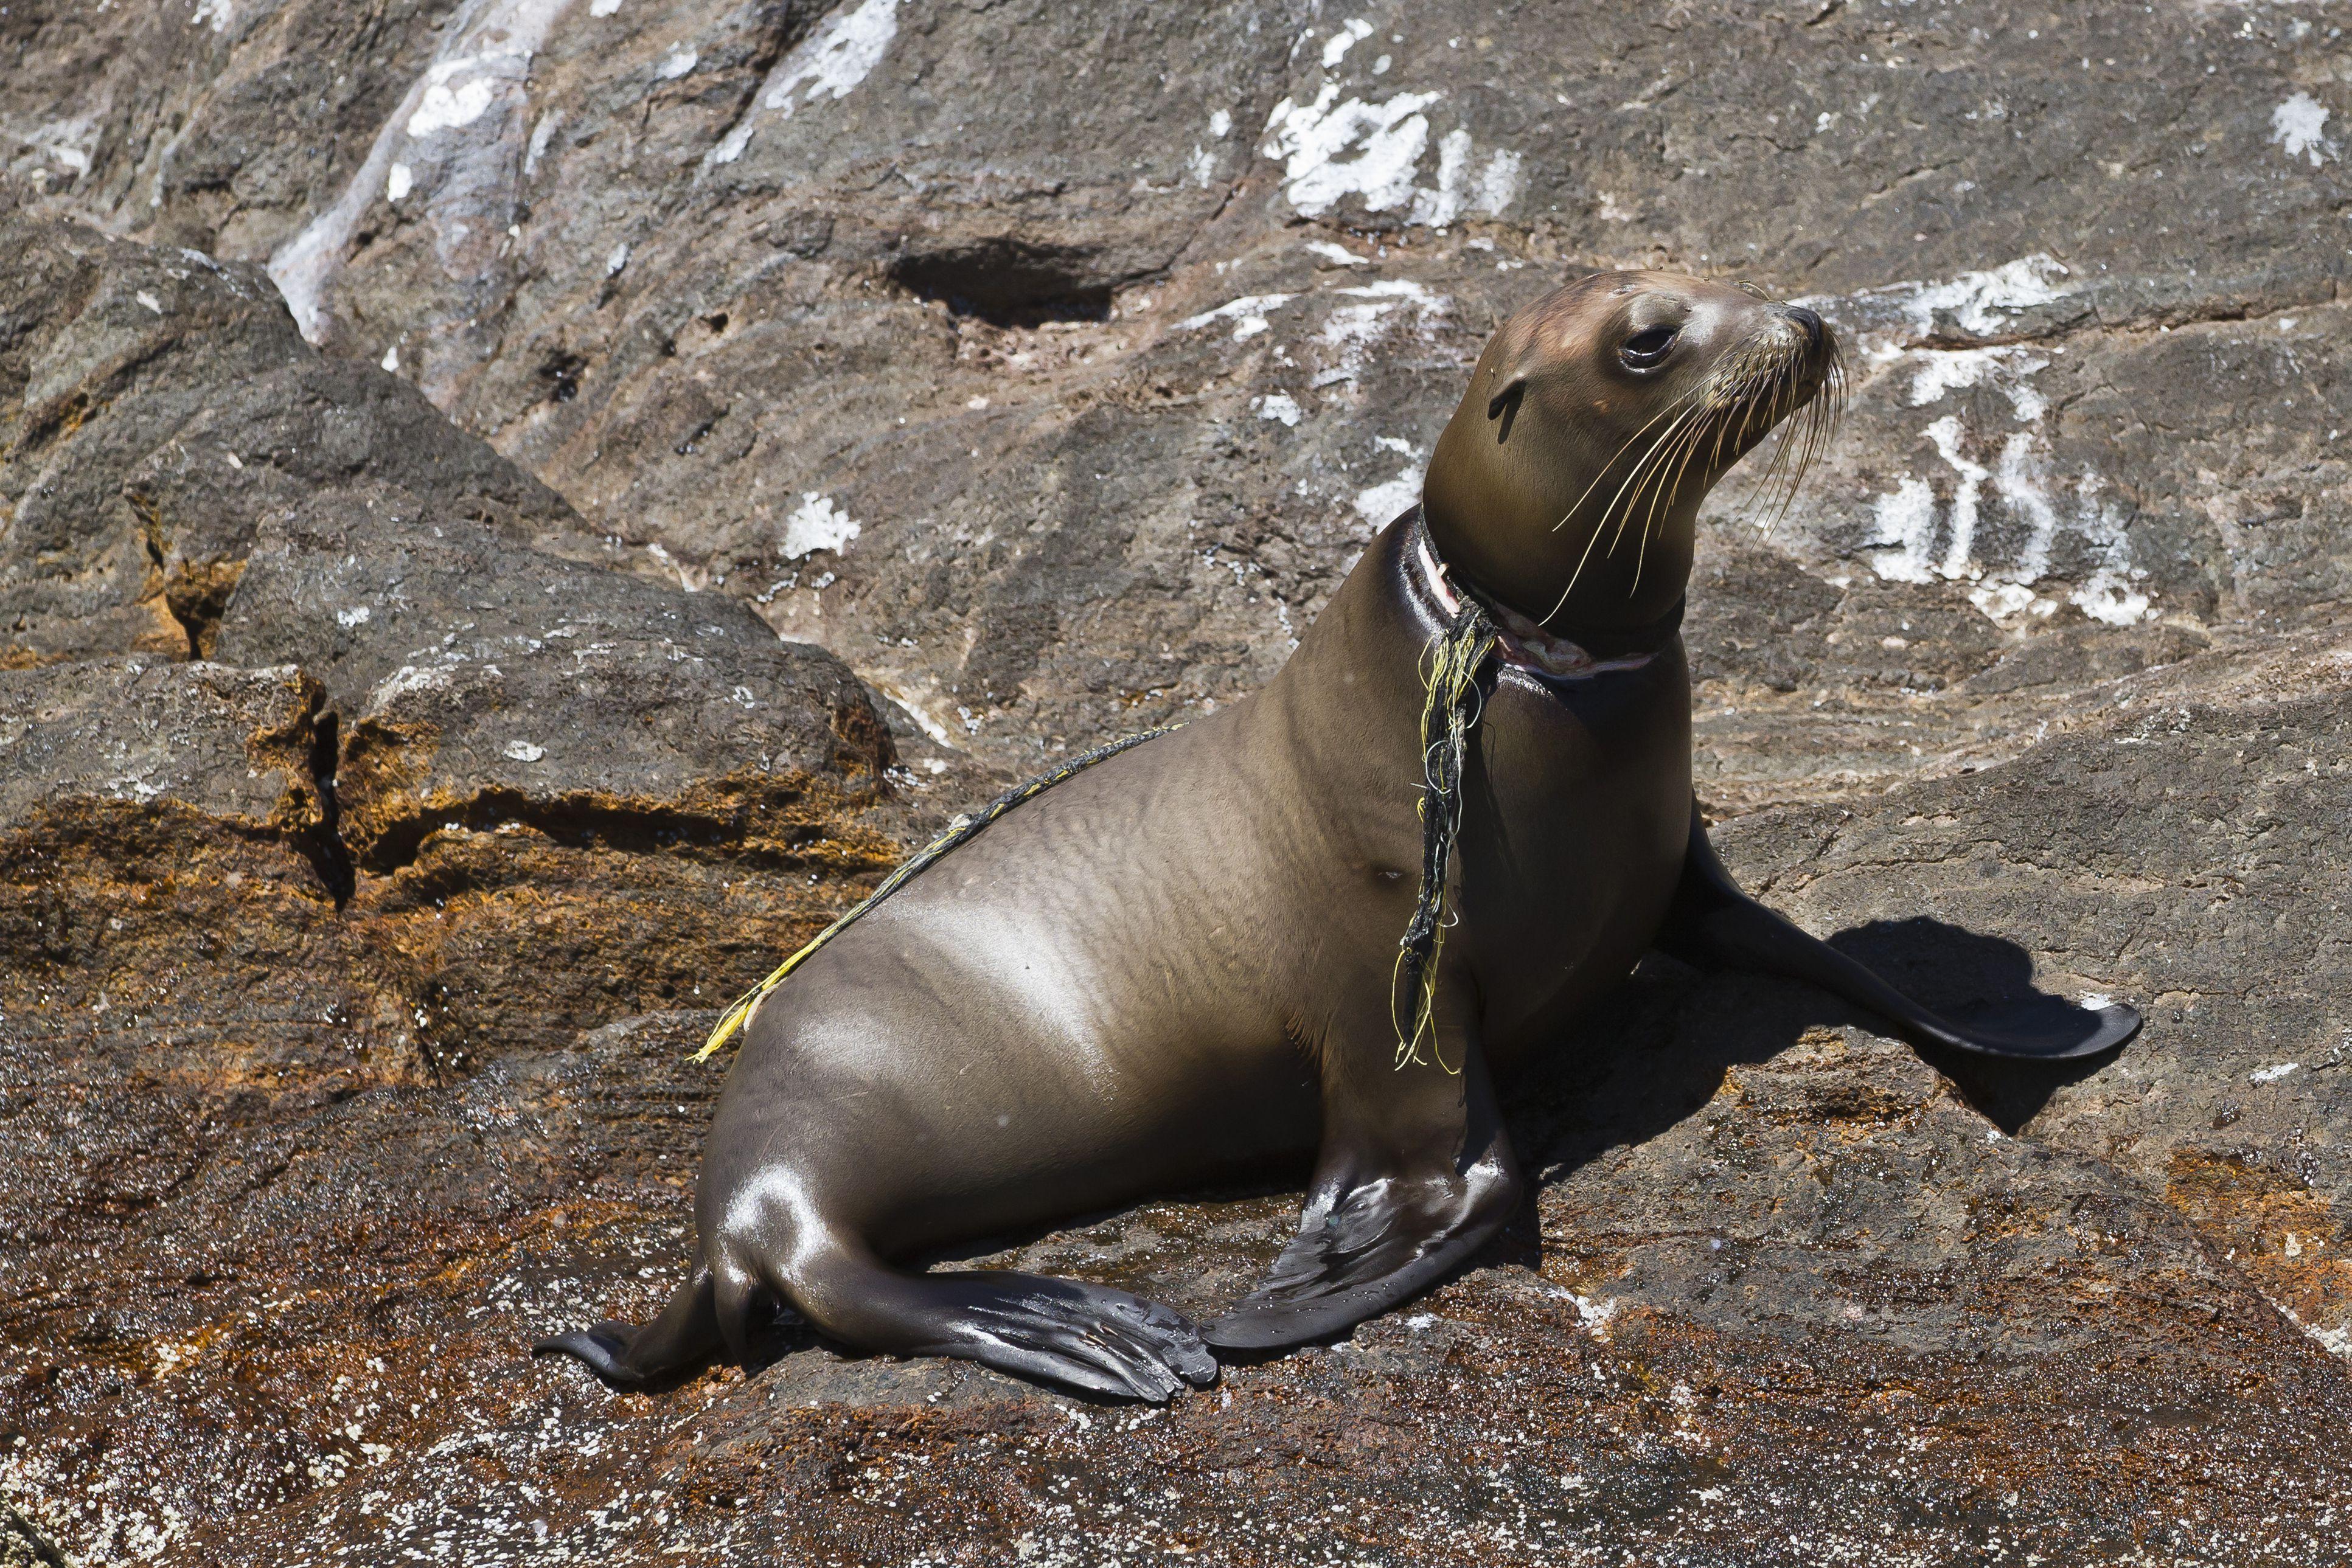 California sea lion pup (Zalophus californianus) entangled in net, Los Islotes, Baja California Sur, Gulf of California (Sea of Cortez), Mexico, North America